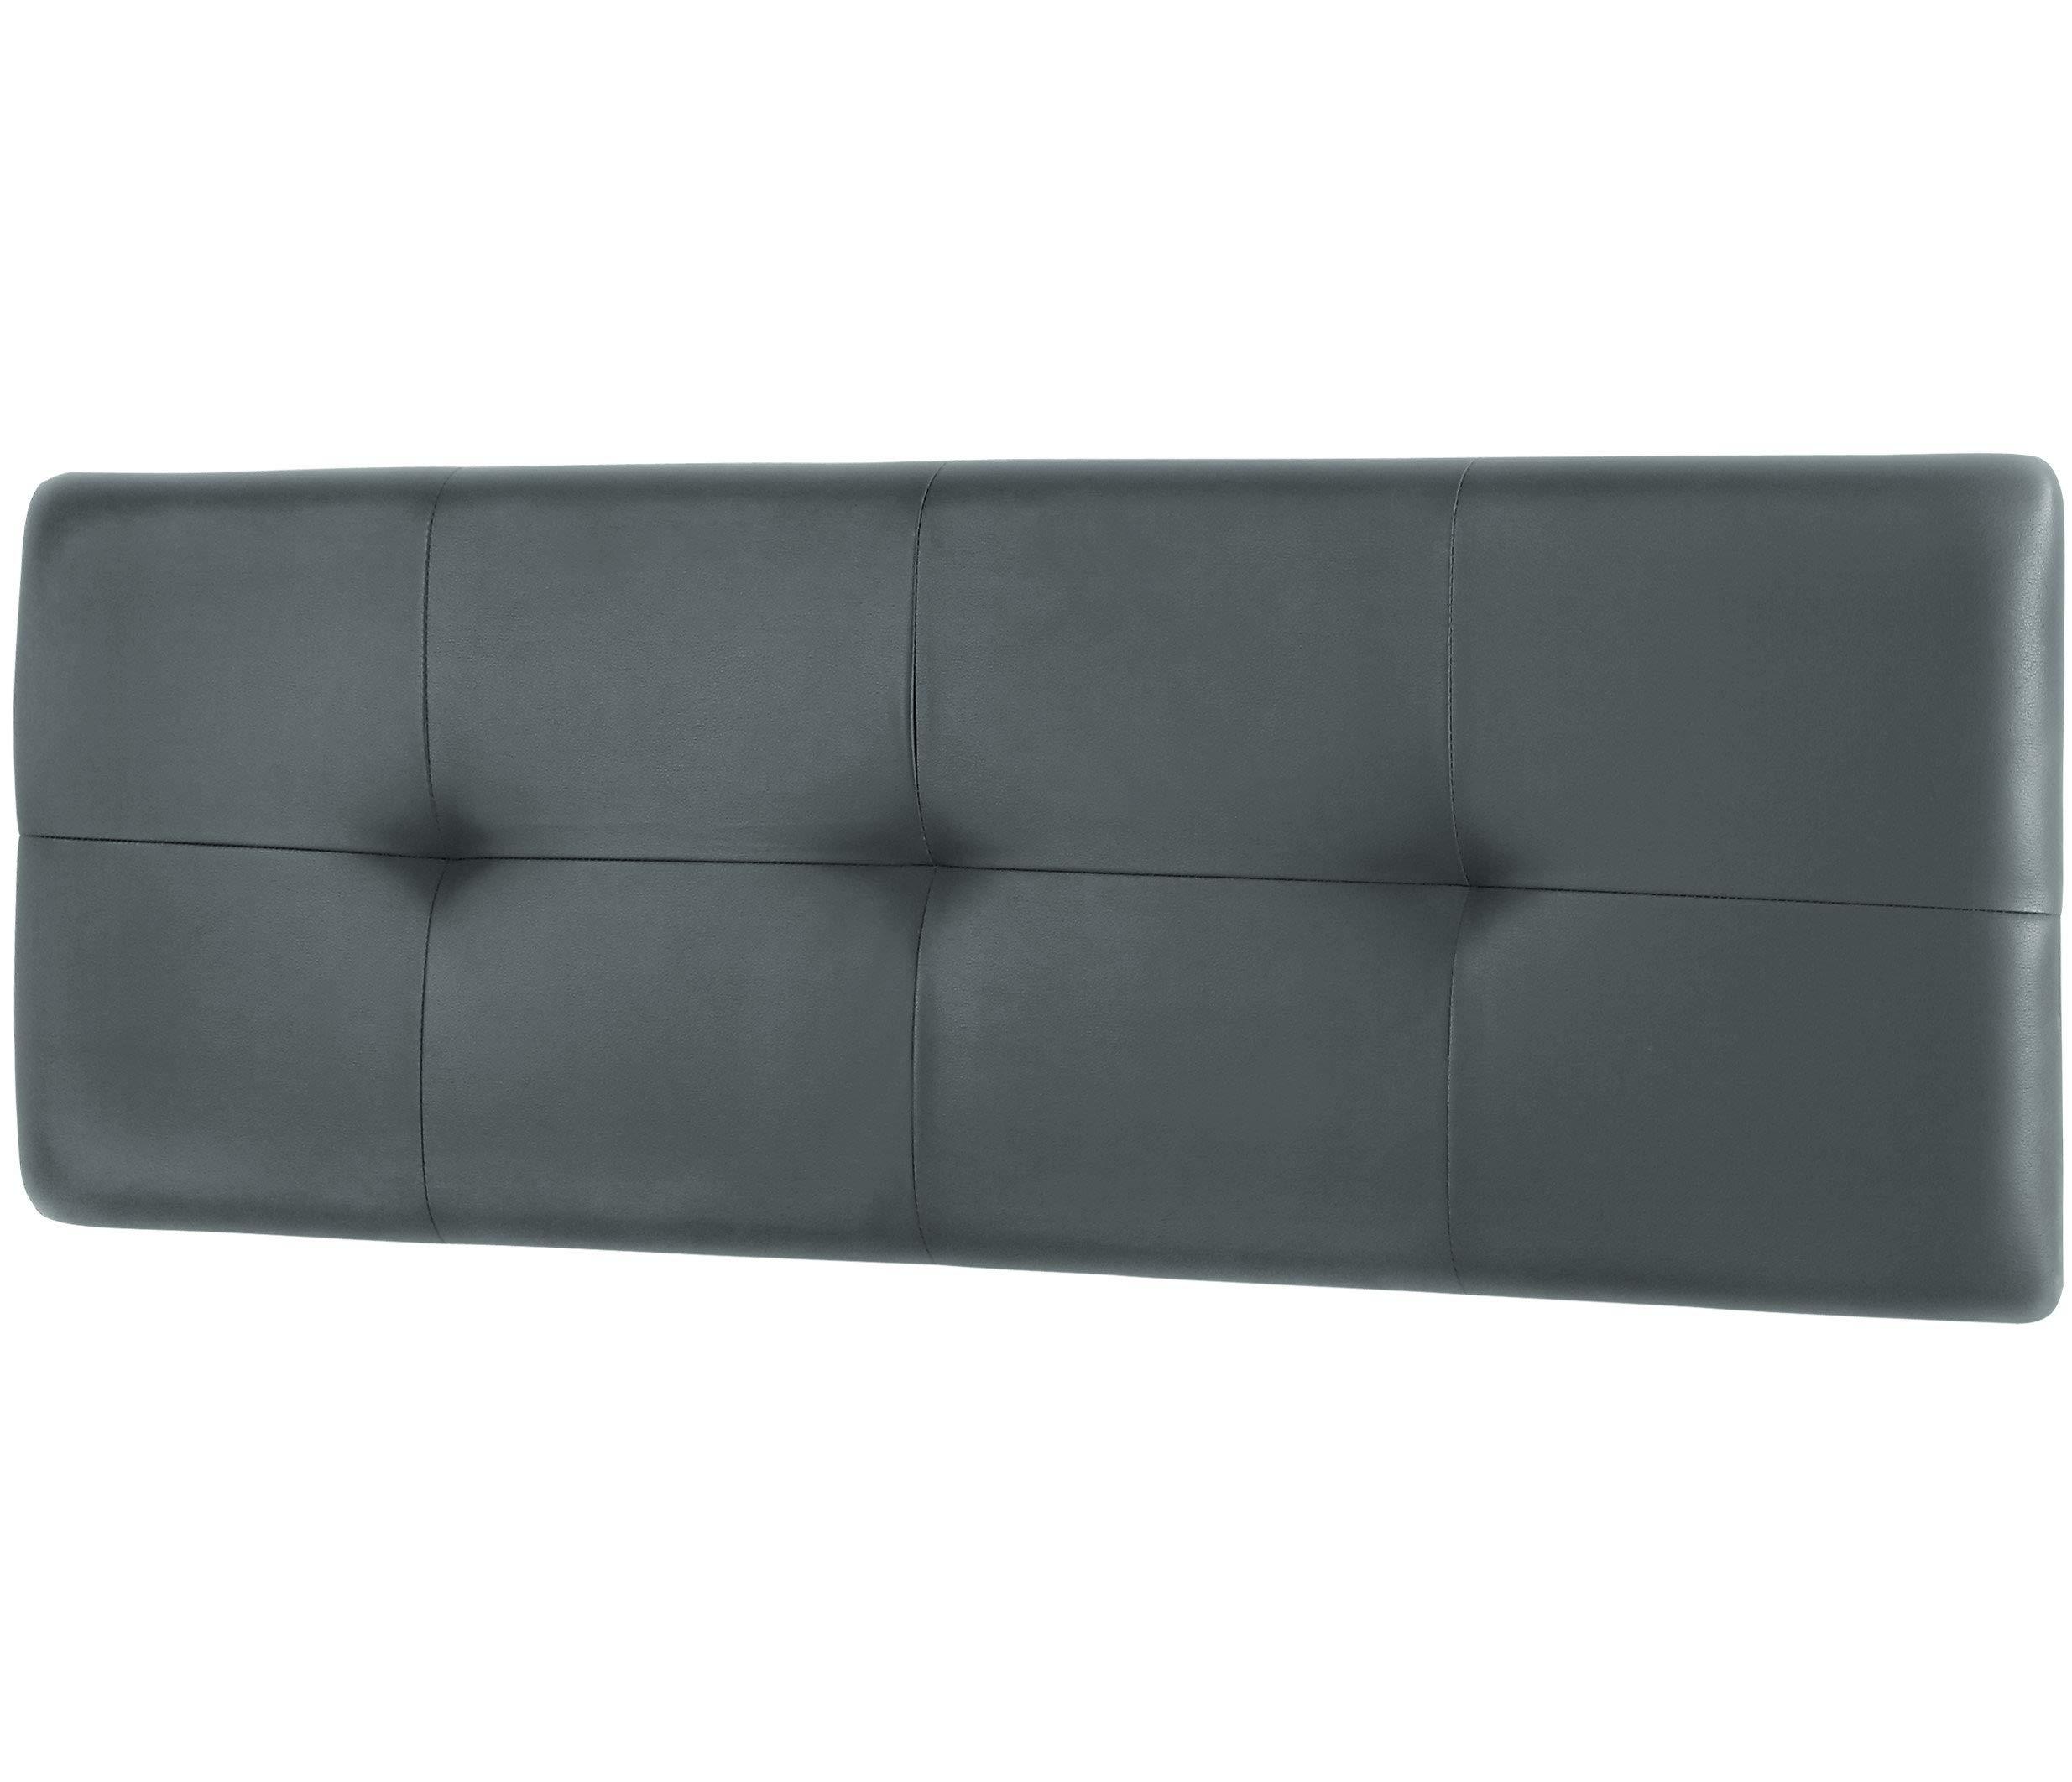 Studio Decor Deva - Cabecero de cama de matrimonio tapizado en polipiel, Grafito, 160